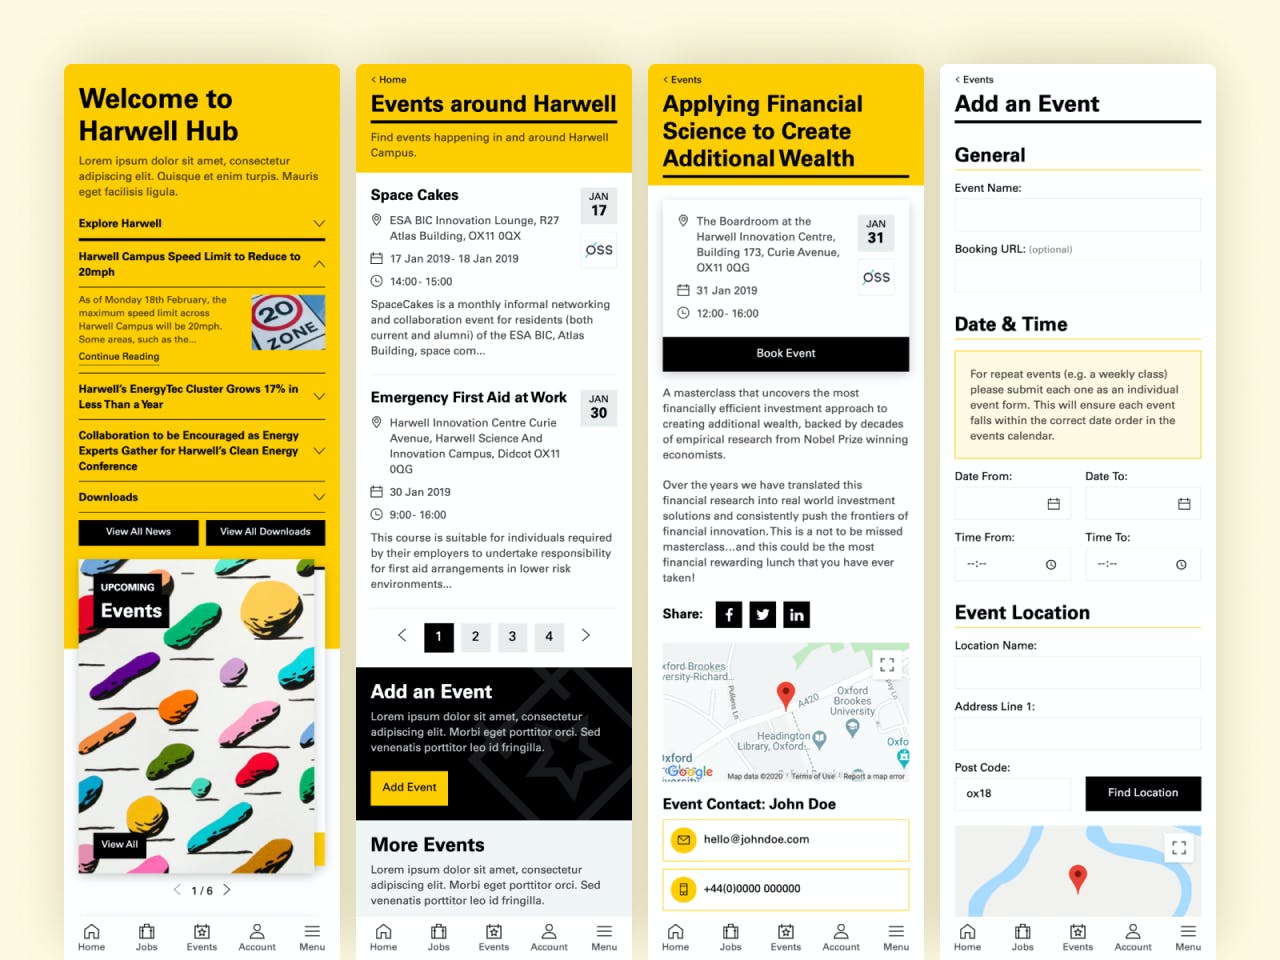 Mobile web app designs for Harwell Hub